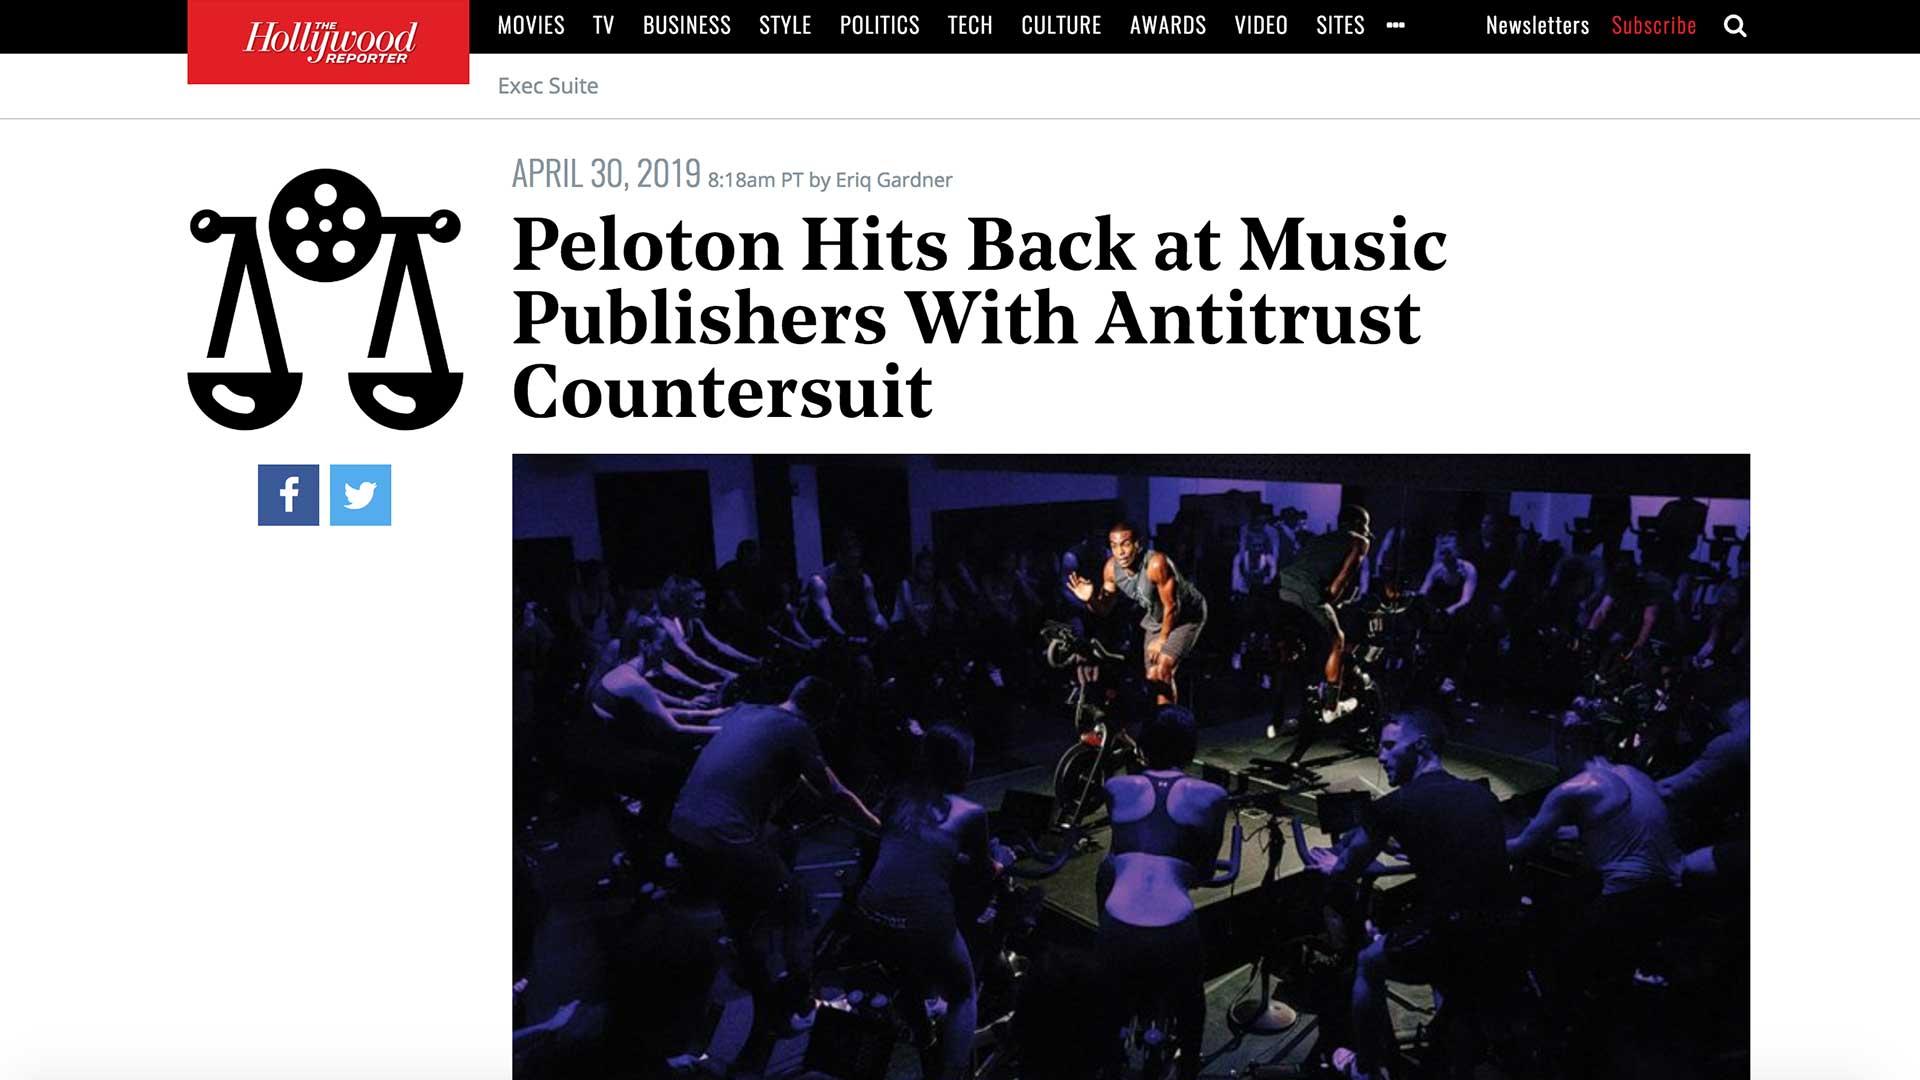 Fairness Rocks News Peloton Hits Back at Music Publishers With Antitrust Countersuit